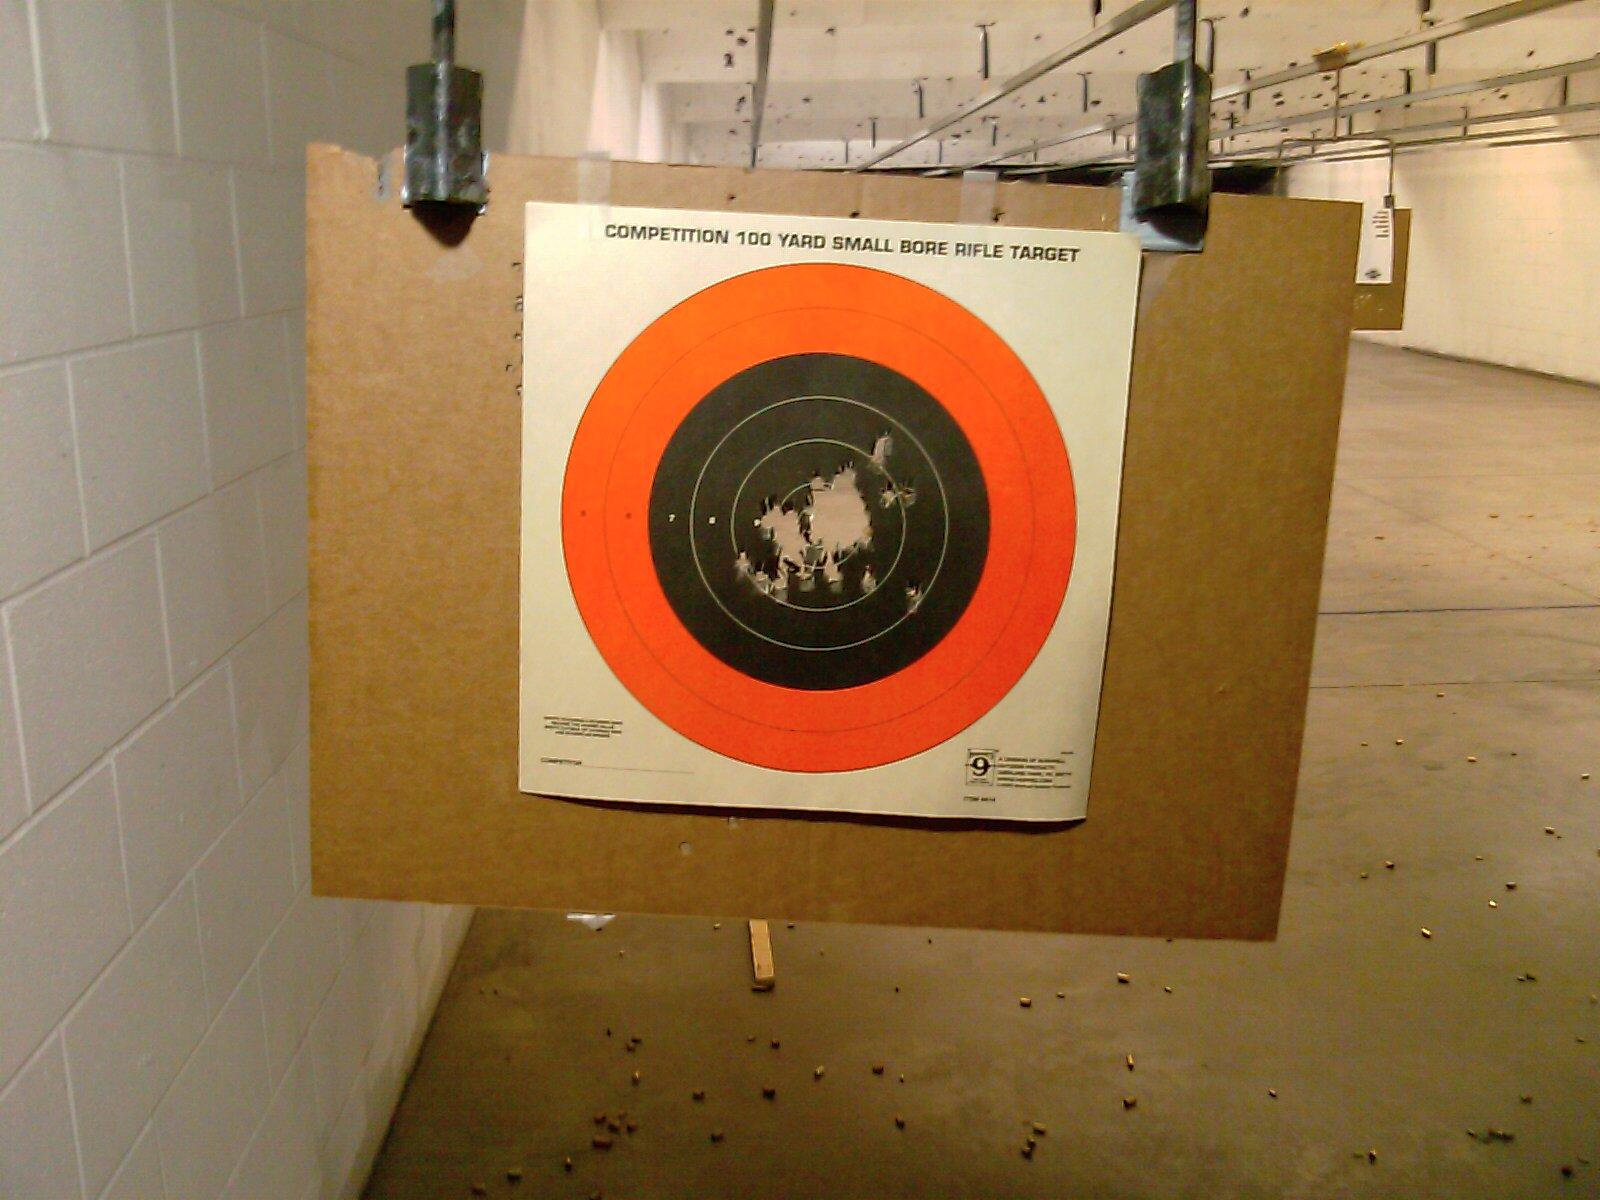 M&P 45 FS/compact frame swap-2-2-09-target.jpg